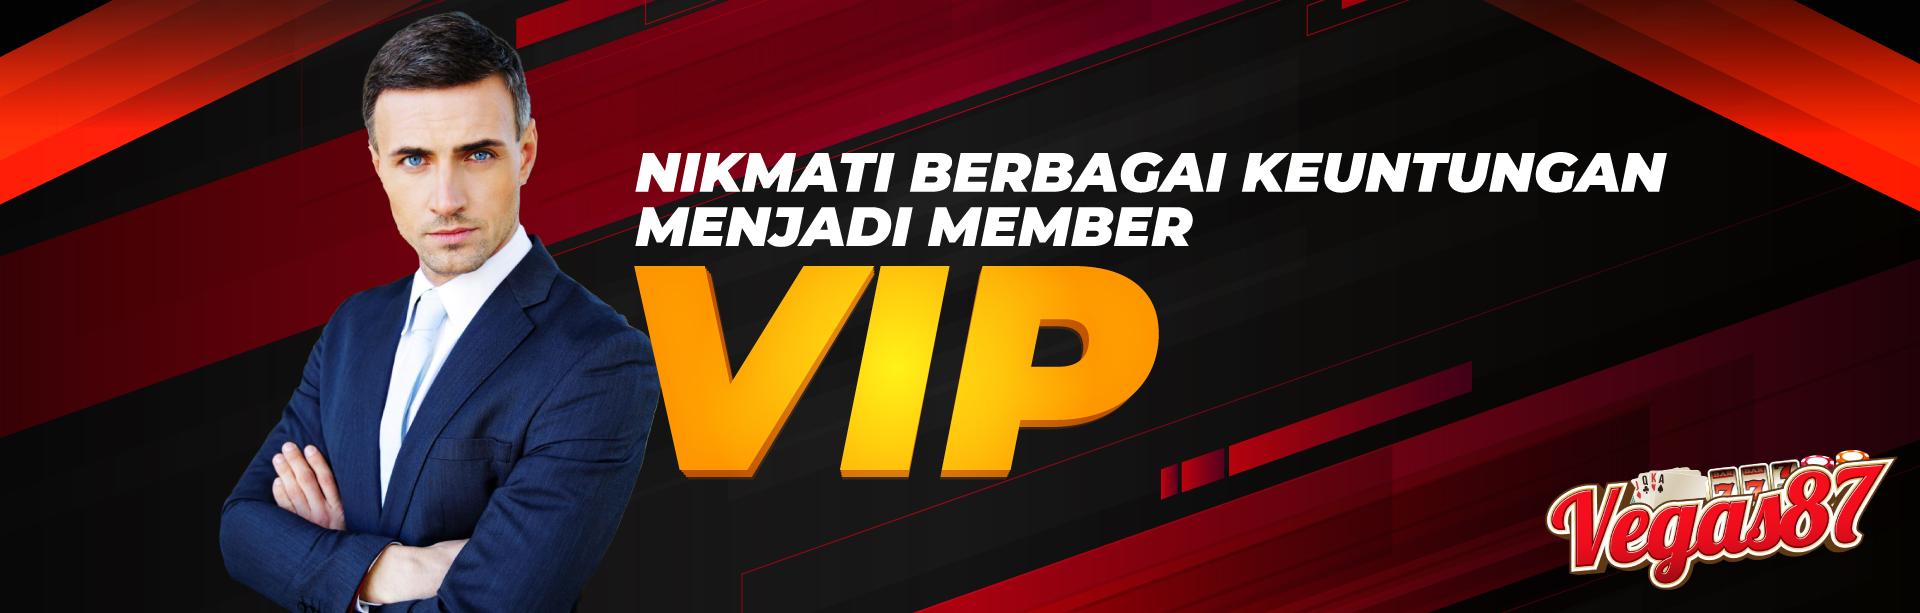 MEMBER BENEFITS VIP